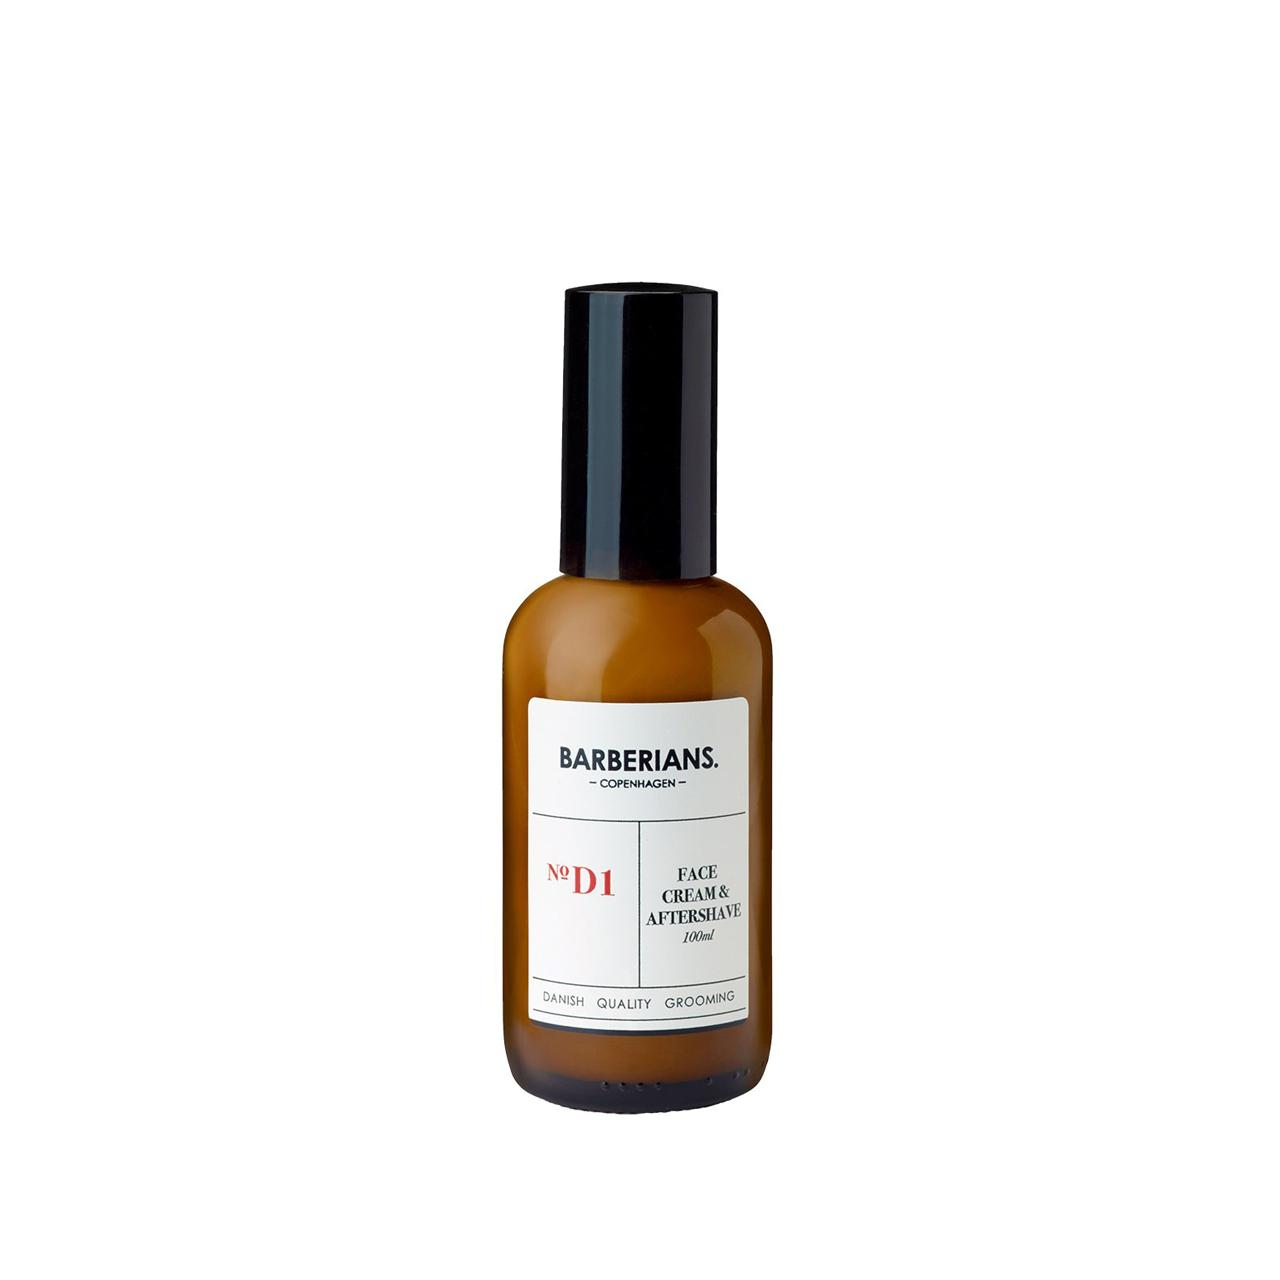 Moisturising Cream - After Shave